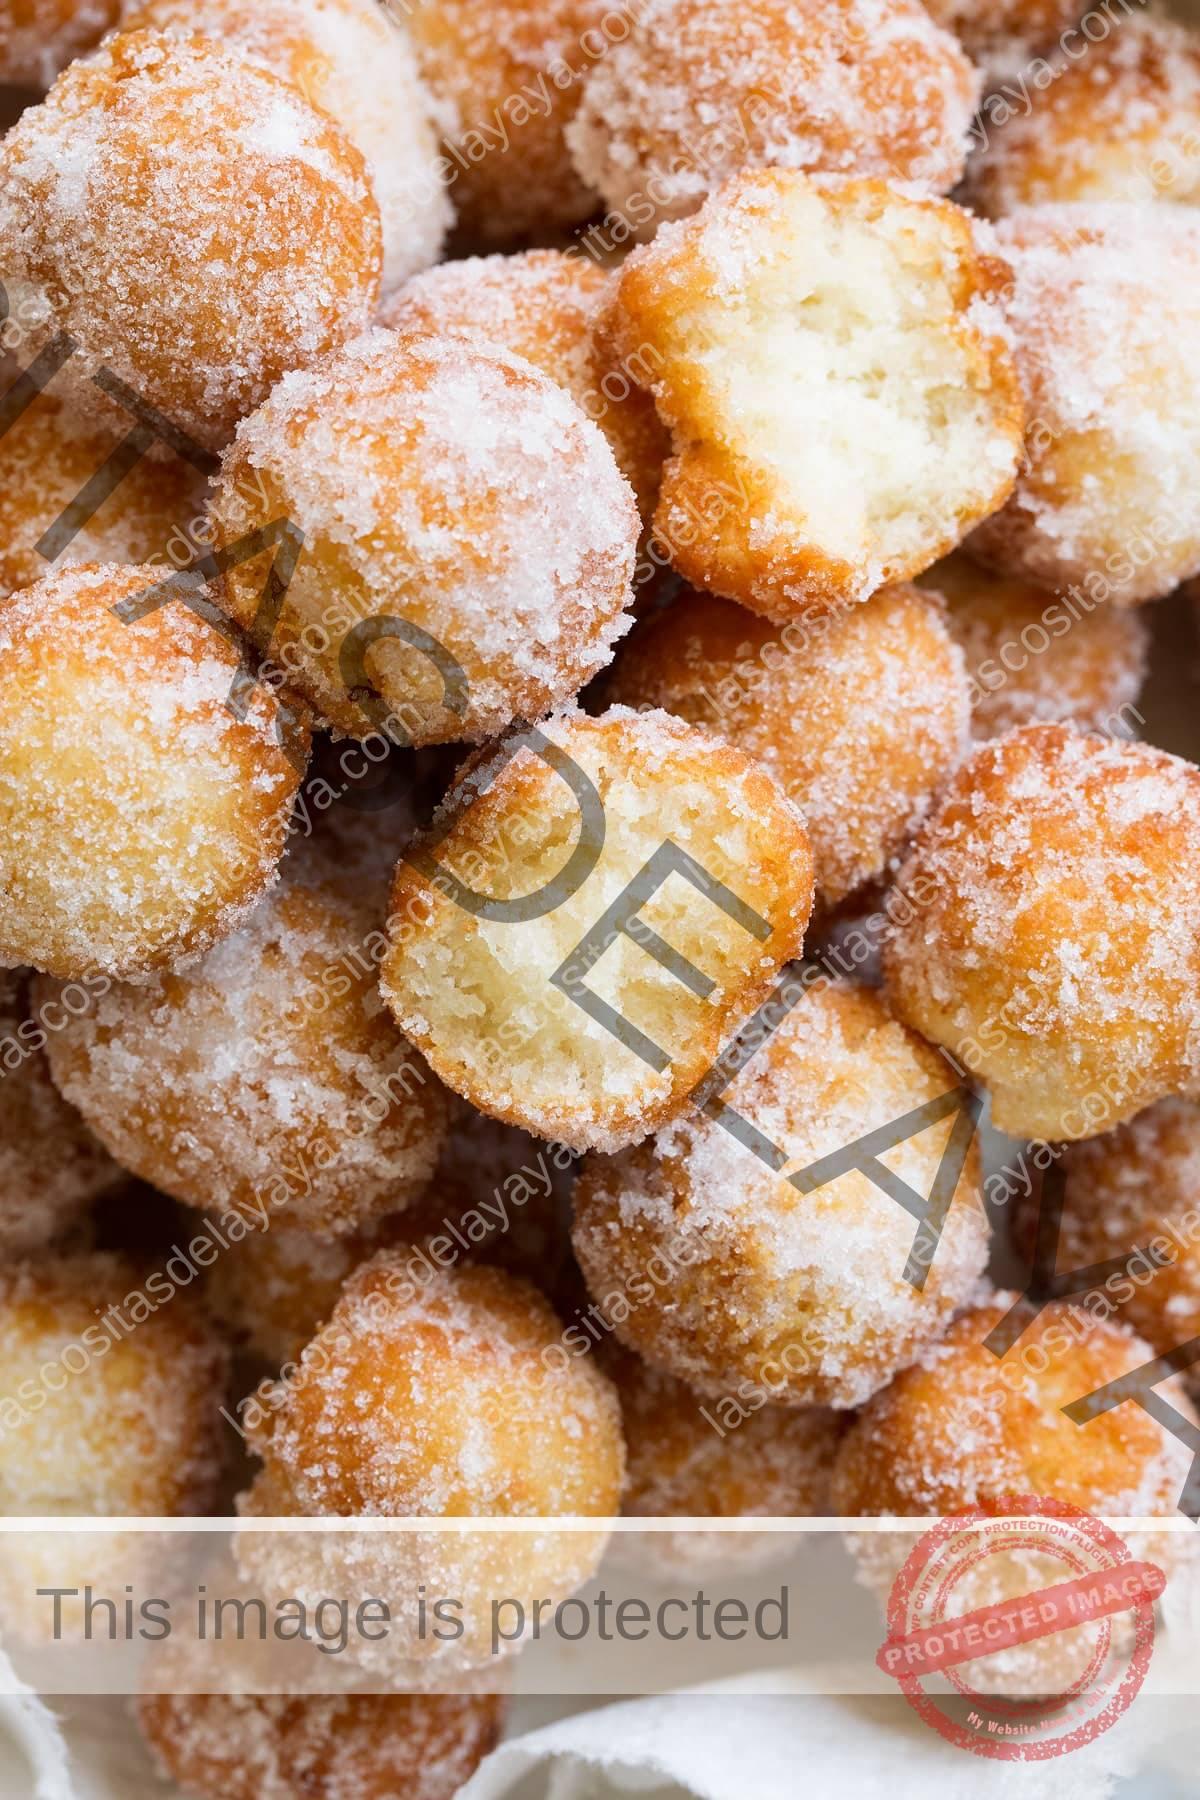 Cerrar imagen de agujeros de rosquilla recubiertos de azúcar canela.